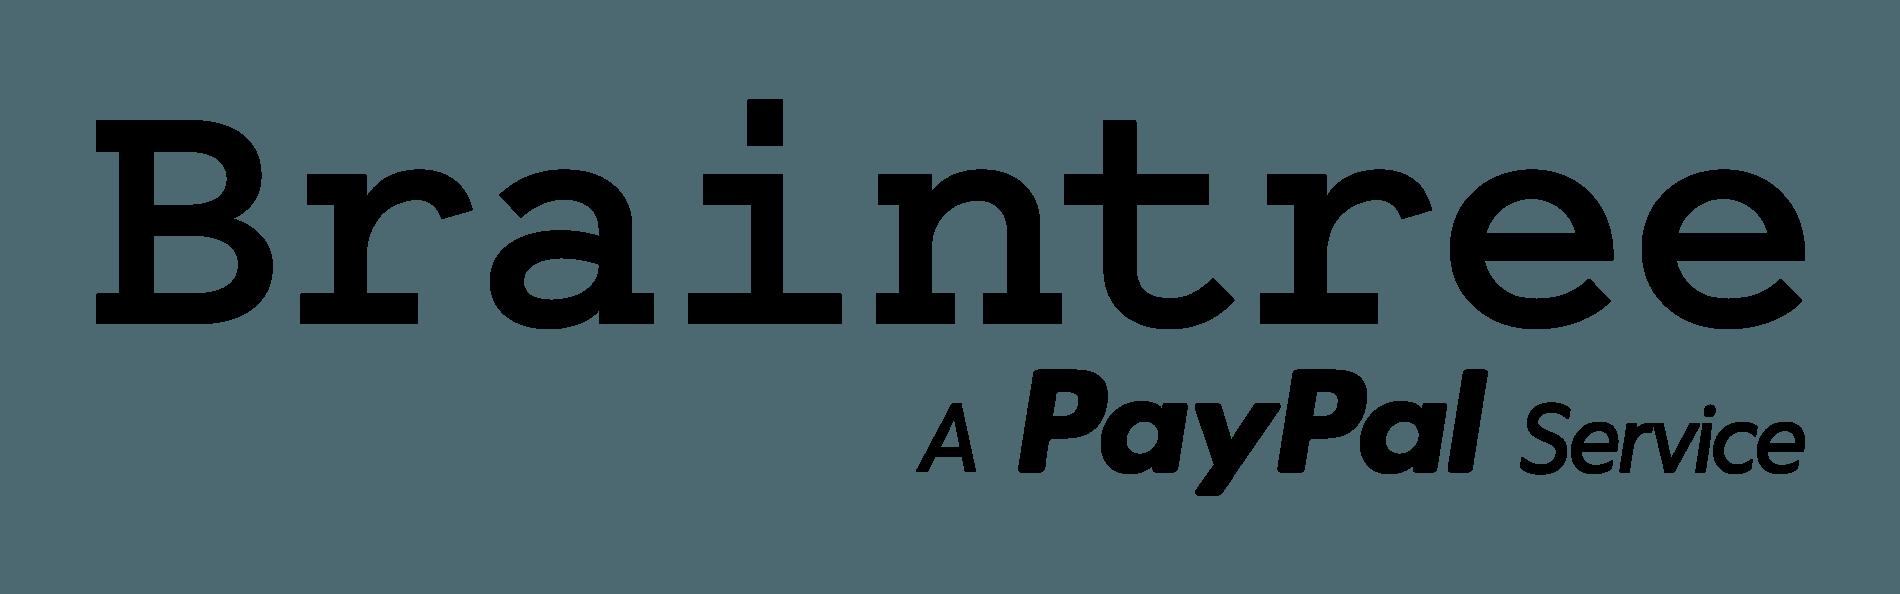 braintree-paypal-logo-black-1